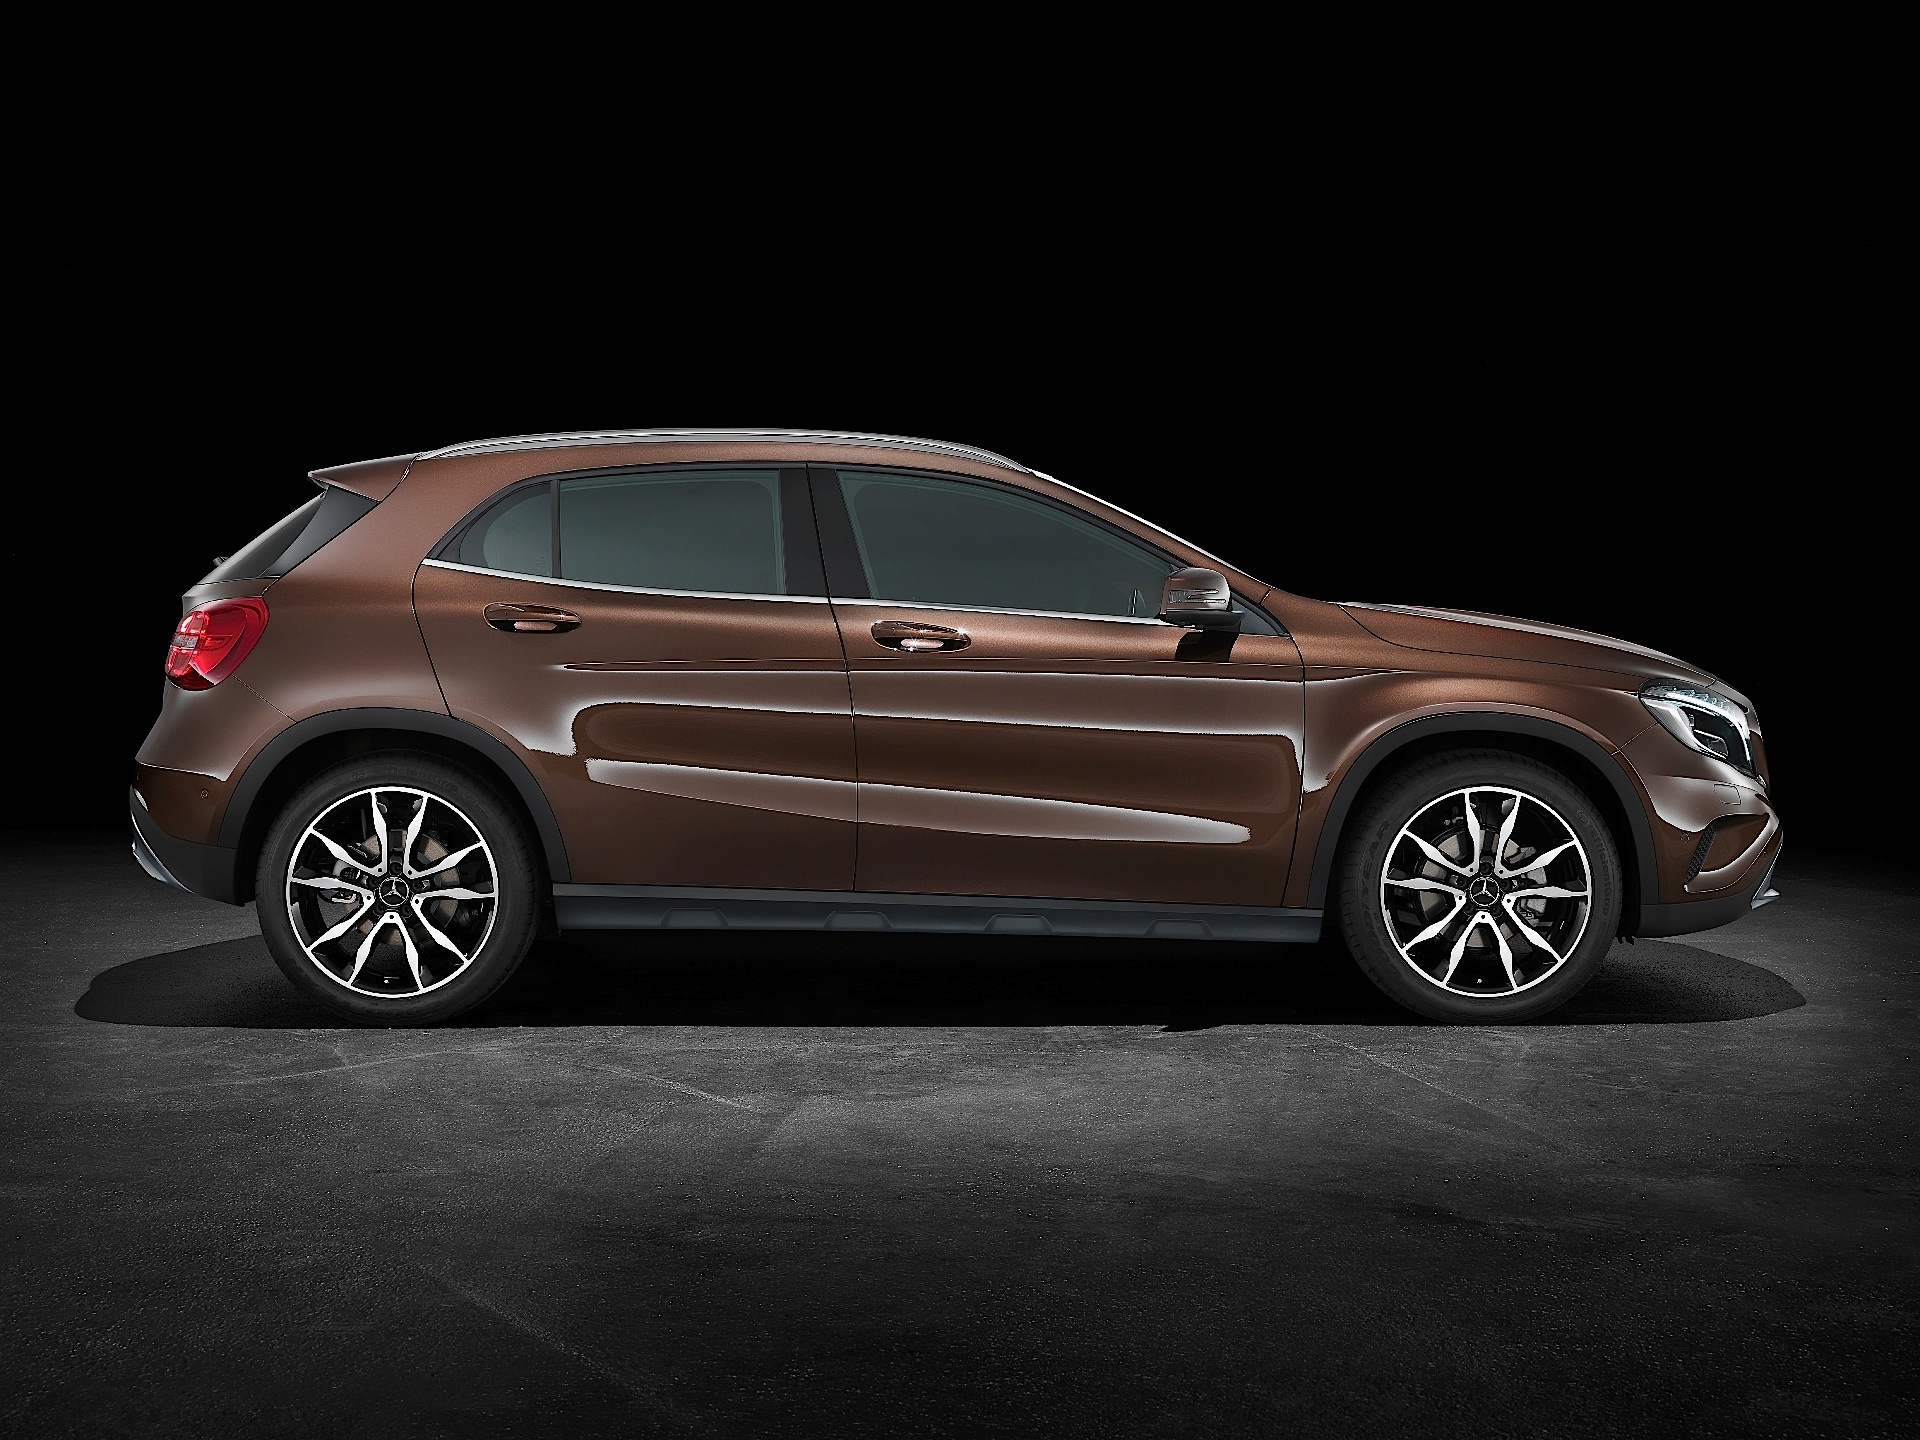 Mercedes benz gla 2013 2014 2015 2016 2017 for Mercedes benz gla 2014